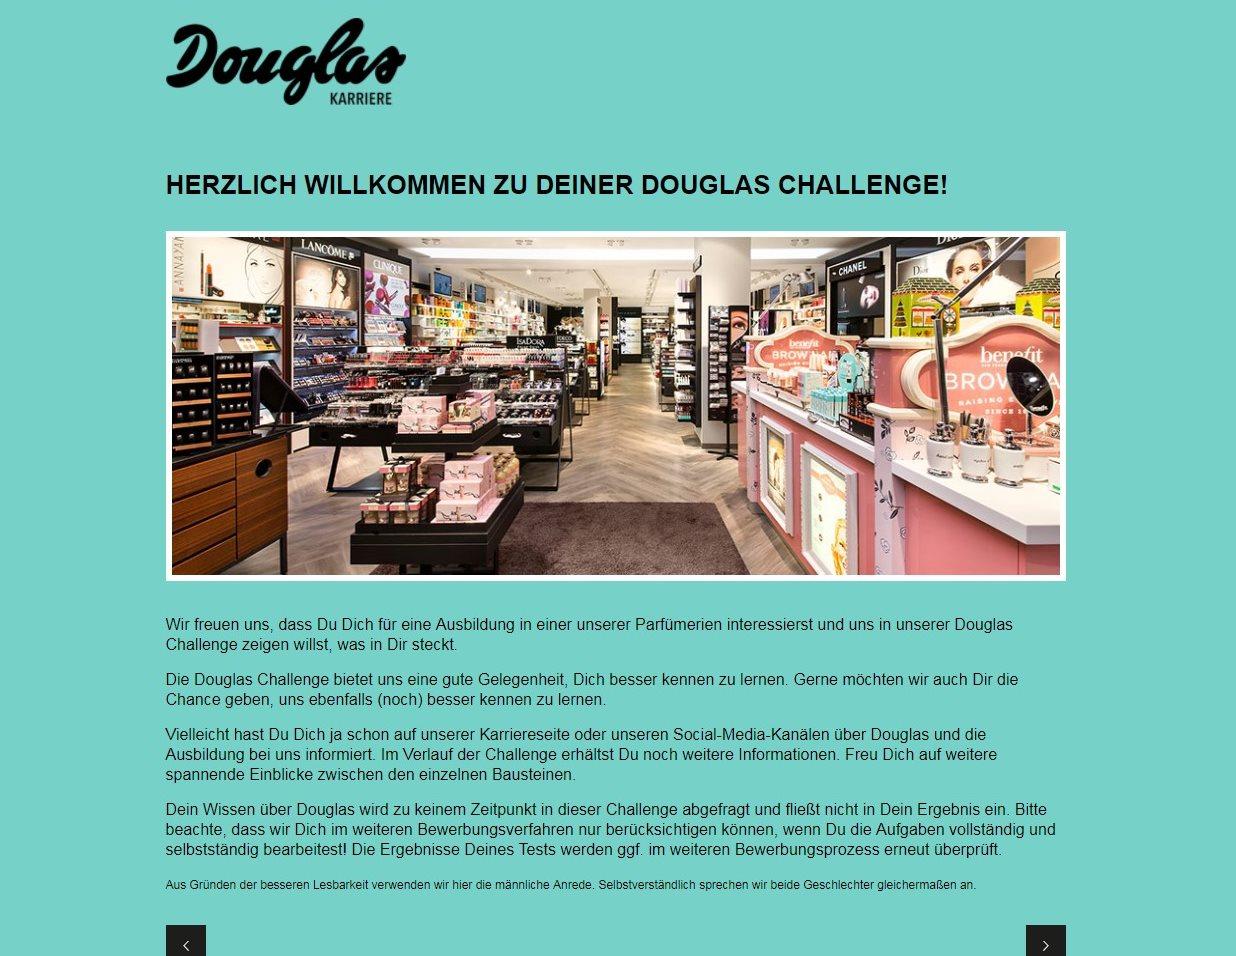 Douglas Nebenjob Douglas Aushilfe Jobs Berlin 2